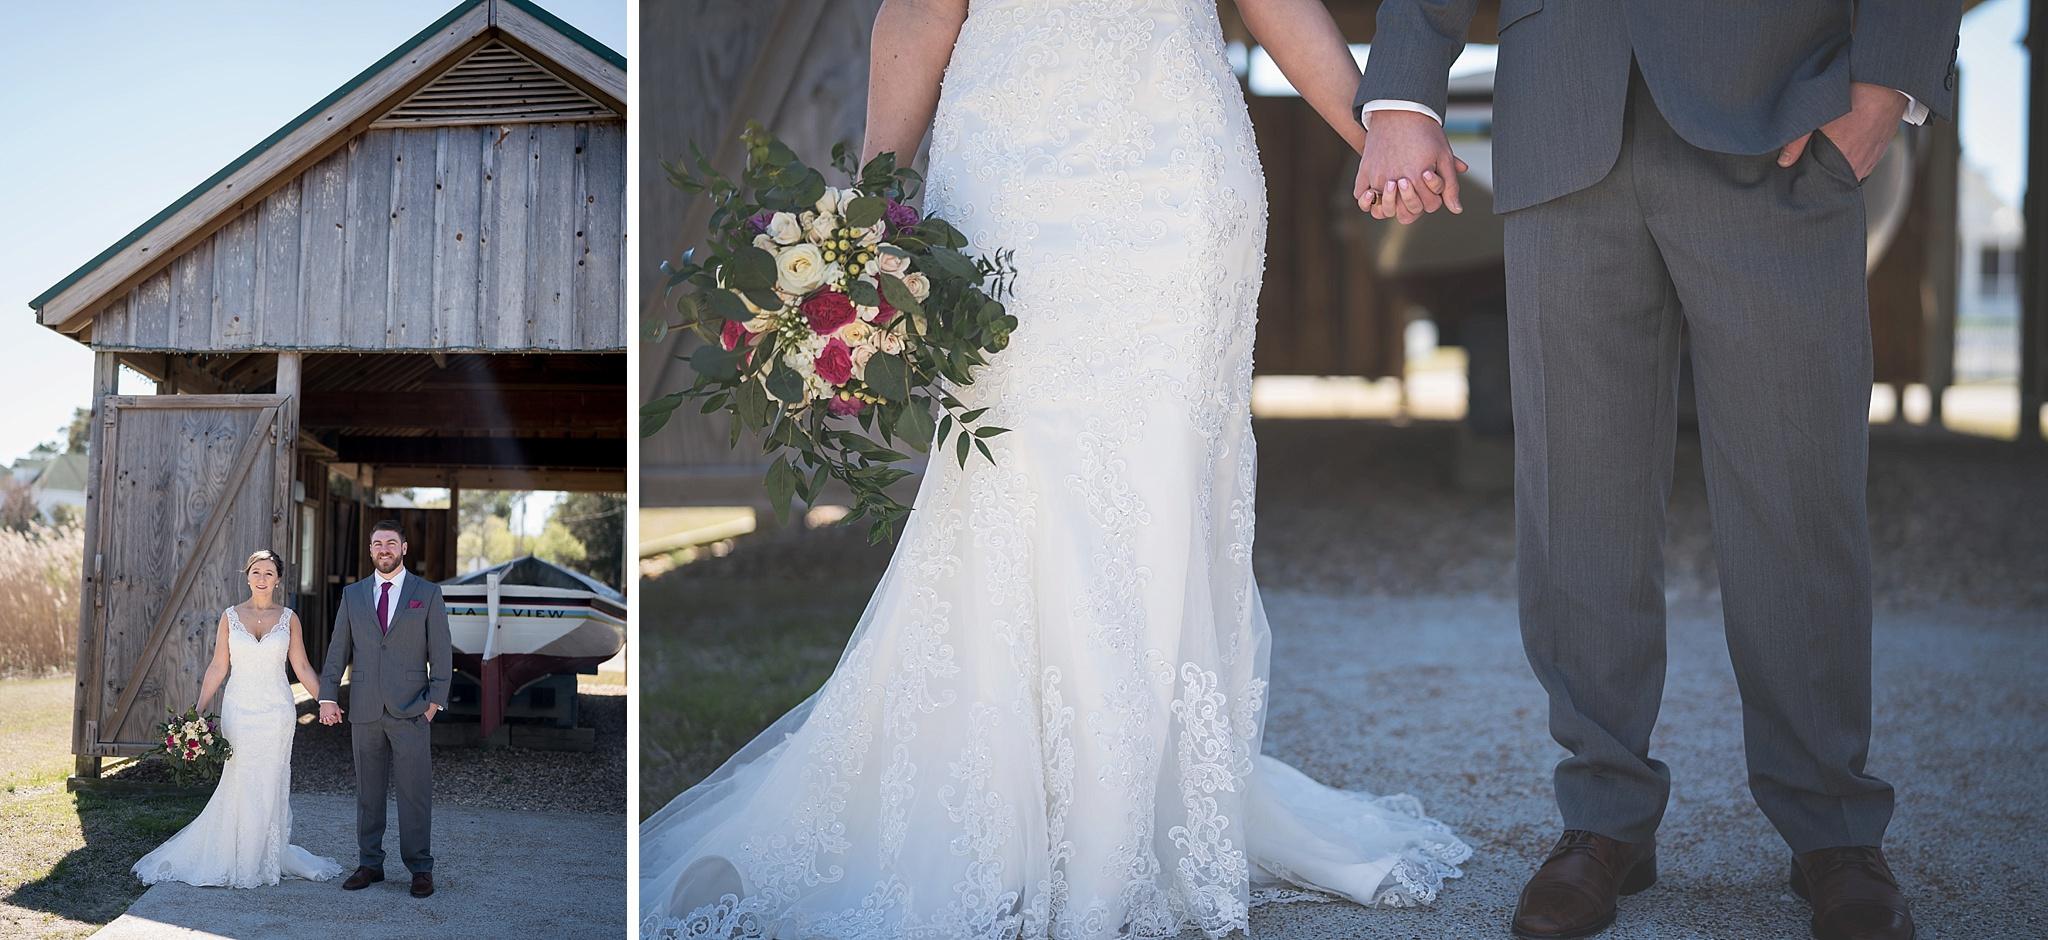 Manteo-NC-Wedding-Photographer-121.jpg